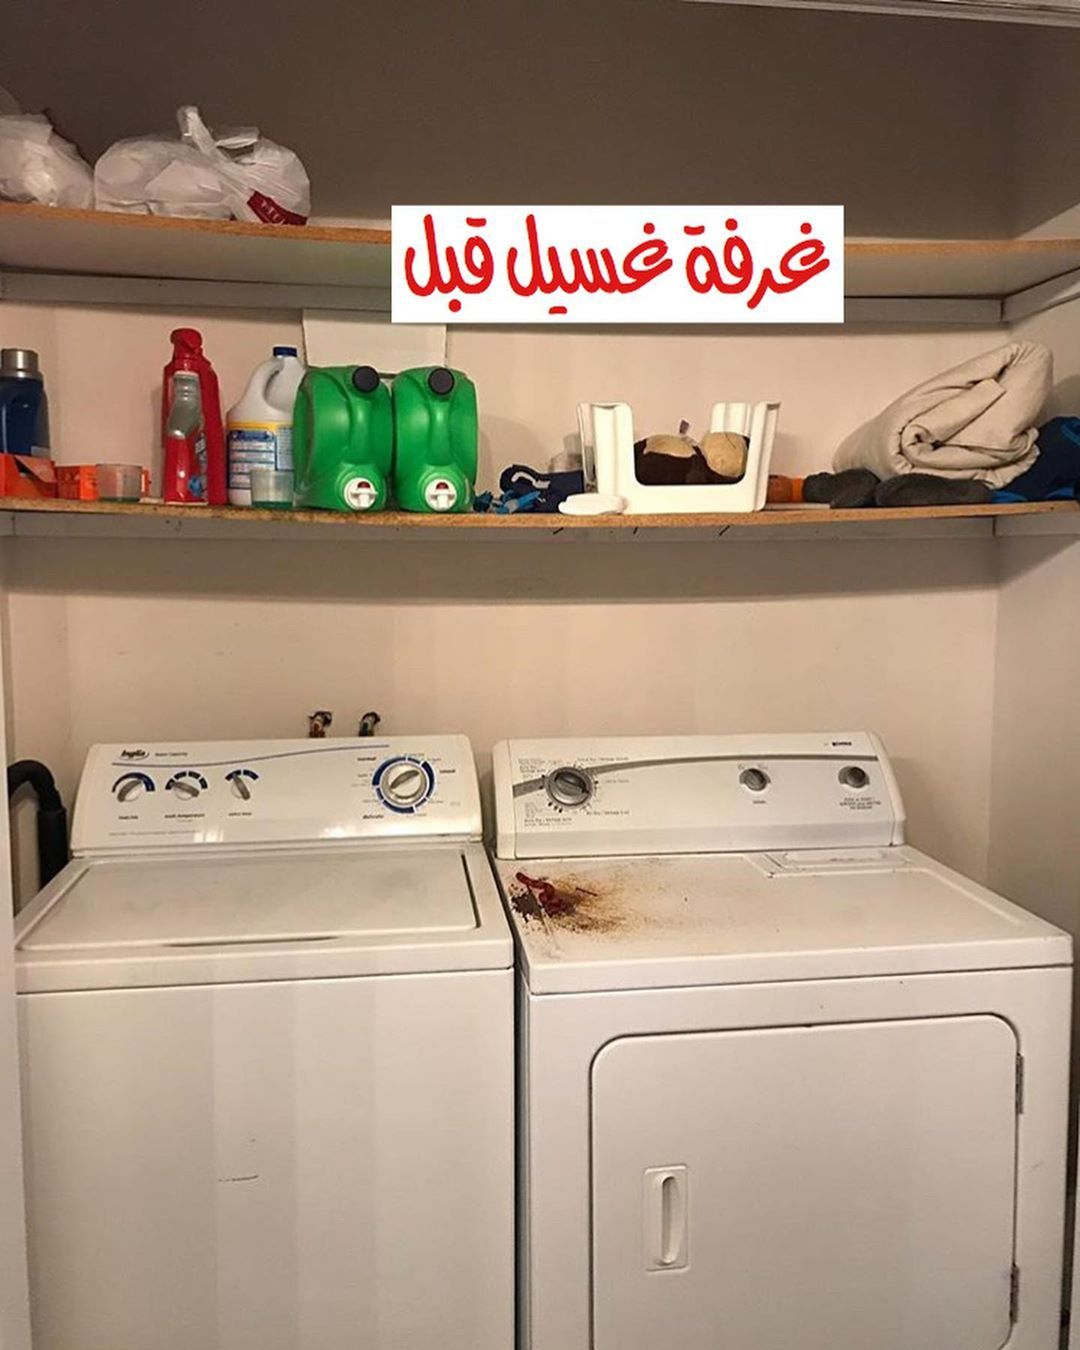 Flcreations On Instagram قبل وبعد من حساب Toshinteriors ديكور ديكورات غرف نوم اعمال فنية جلسة خارجية ديكورات داخلية Home Appliances Room Decor